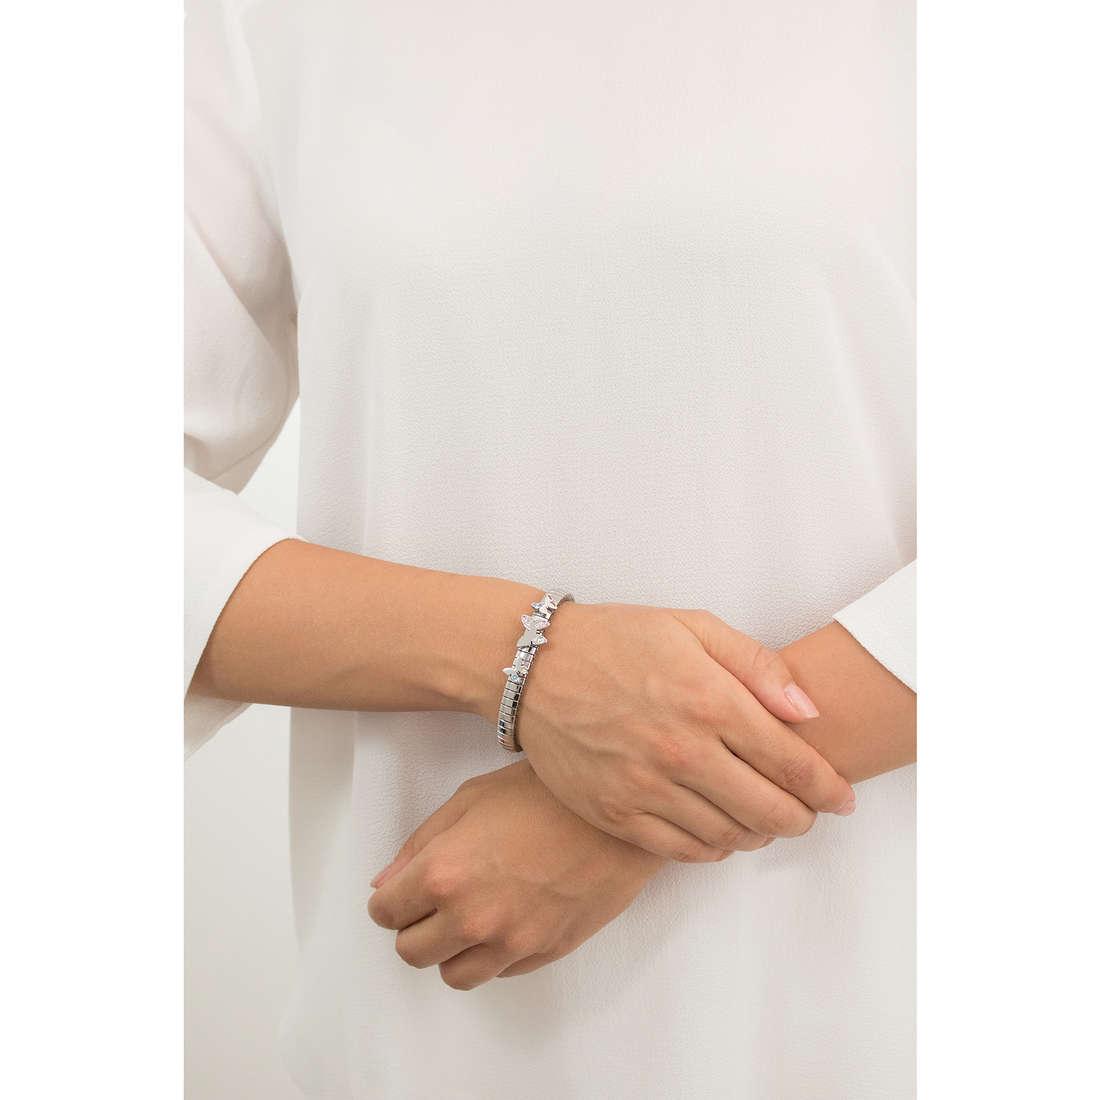 Nomination bracelets Butterfly woman 021300/005 photo wearing